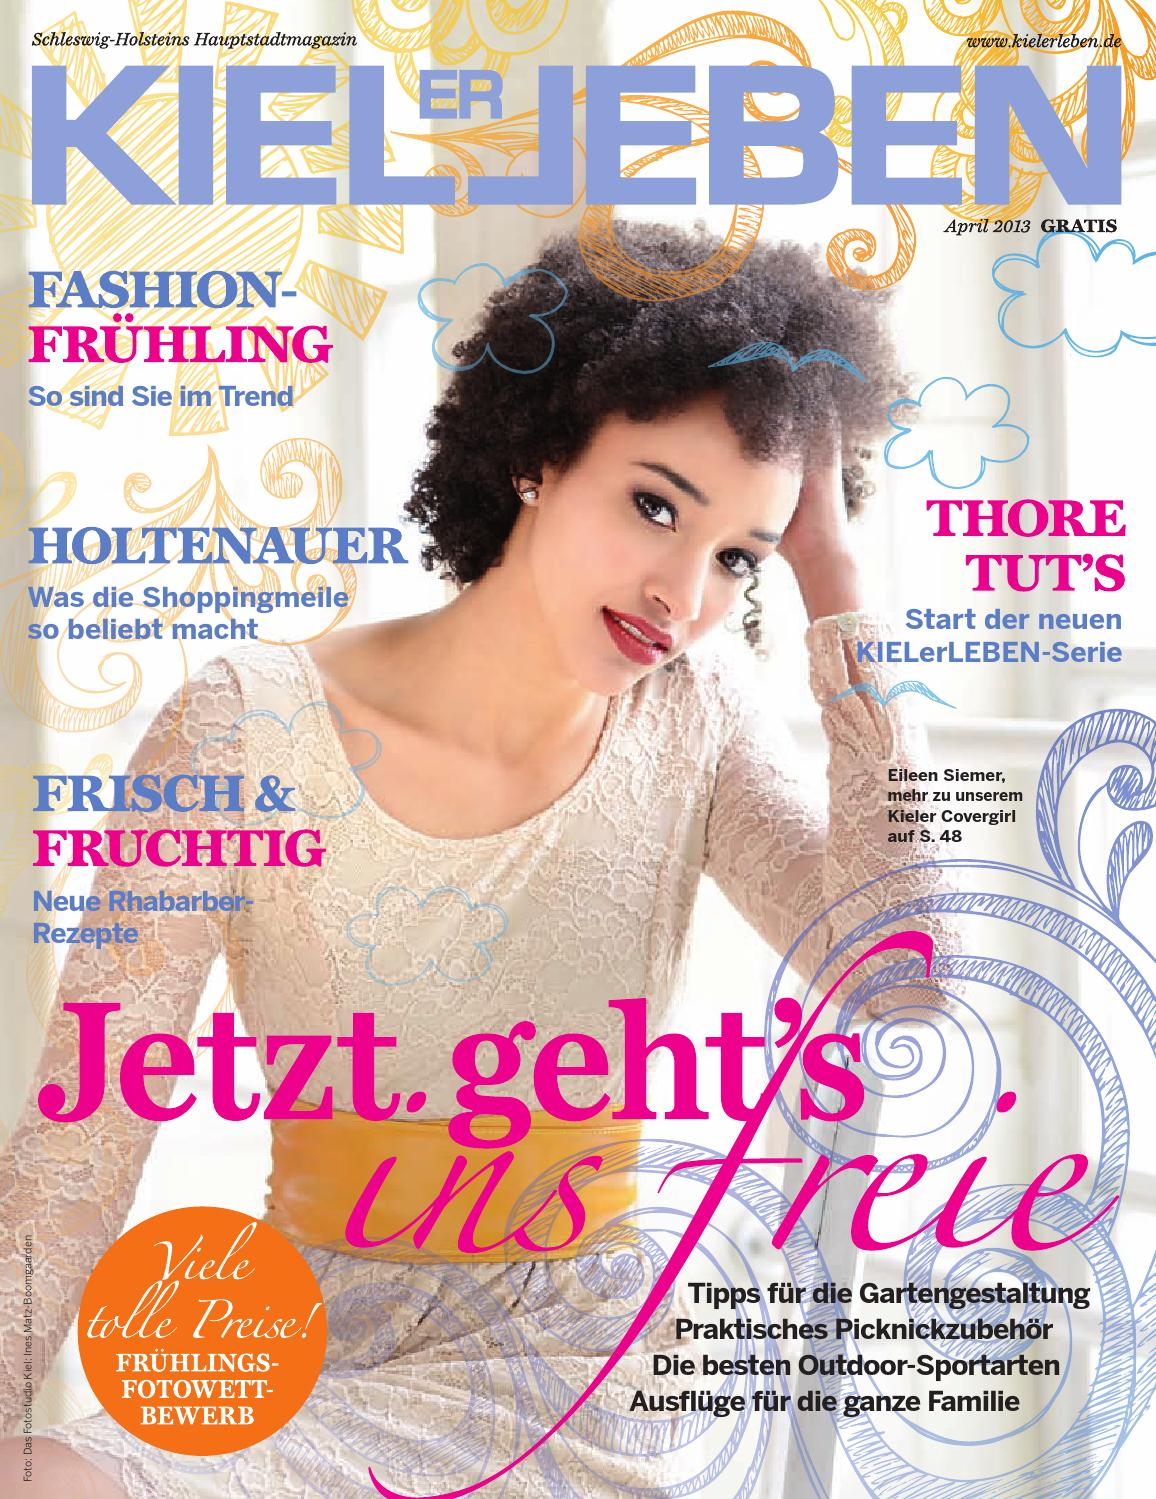 KIELerLEBEN 042013 by falkemedia GmbH & Co. KG issuu